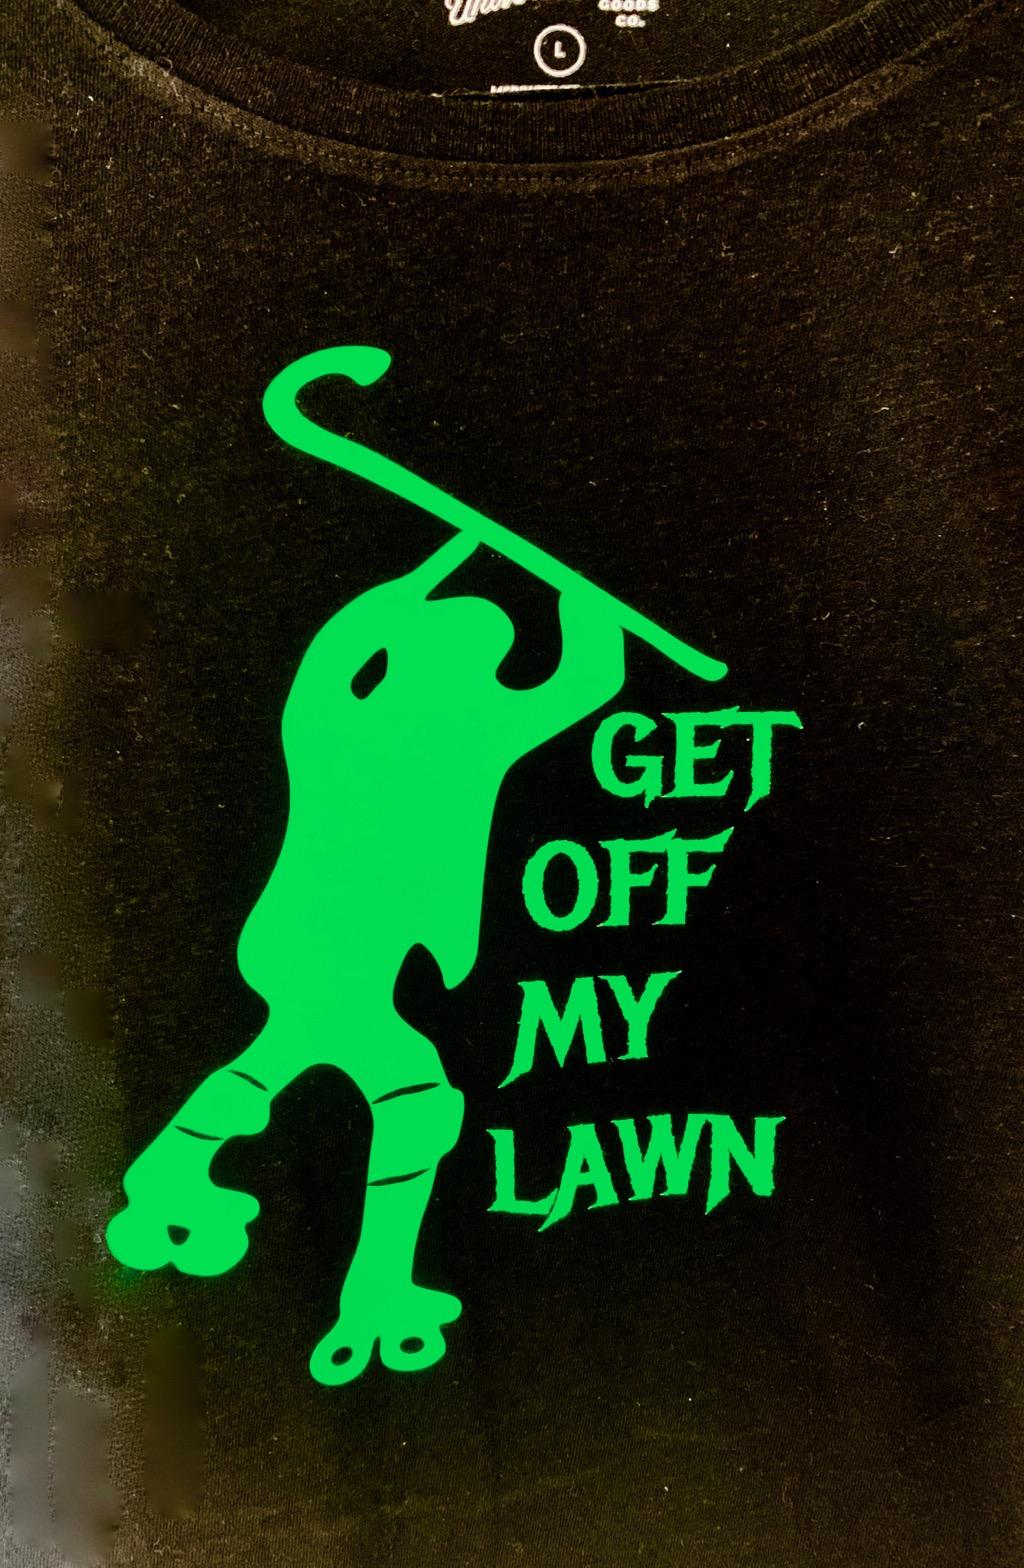 GET OFF MY LAWN -cane